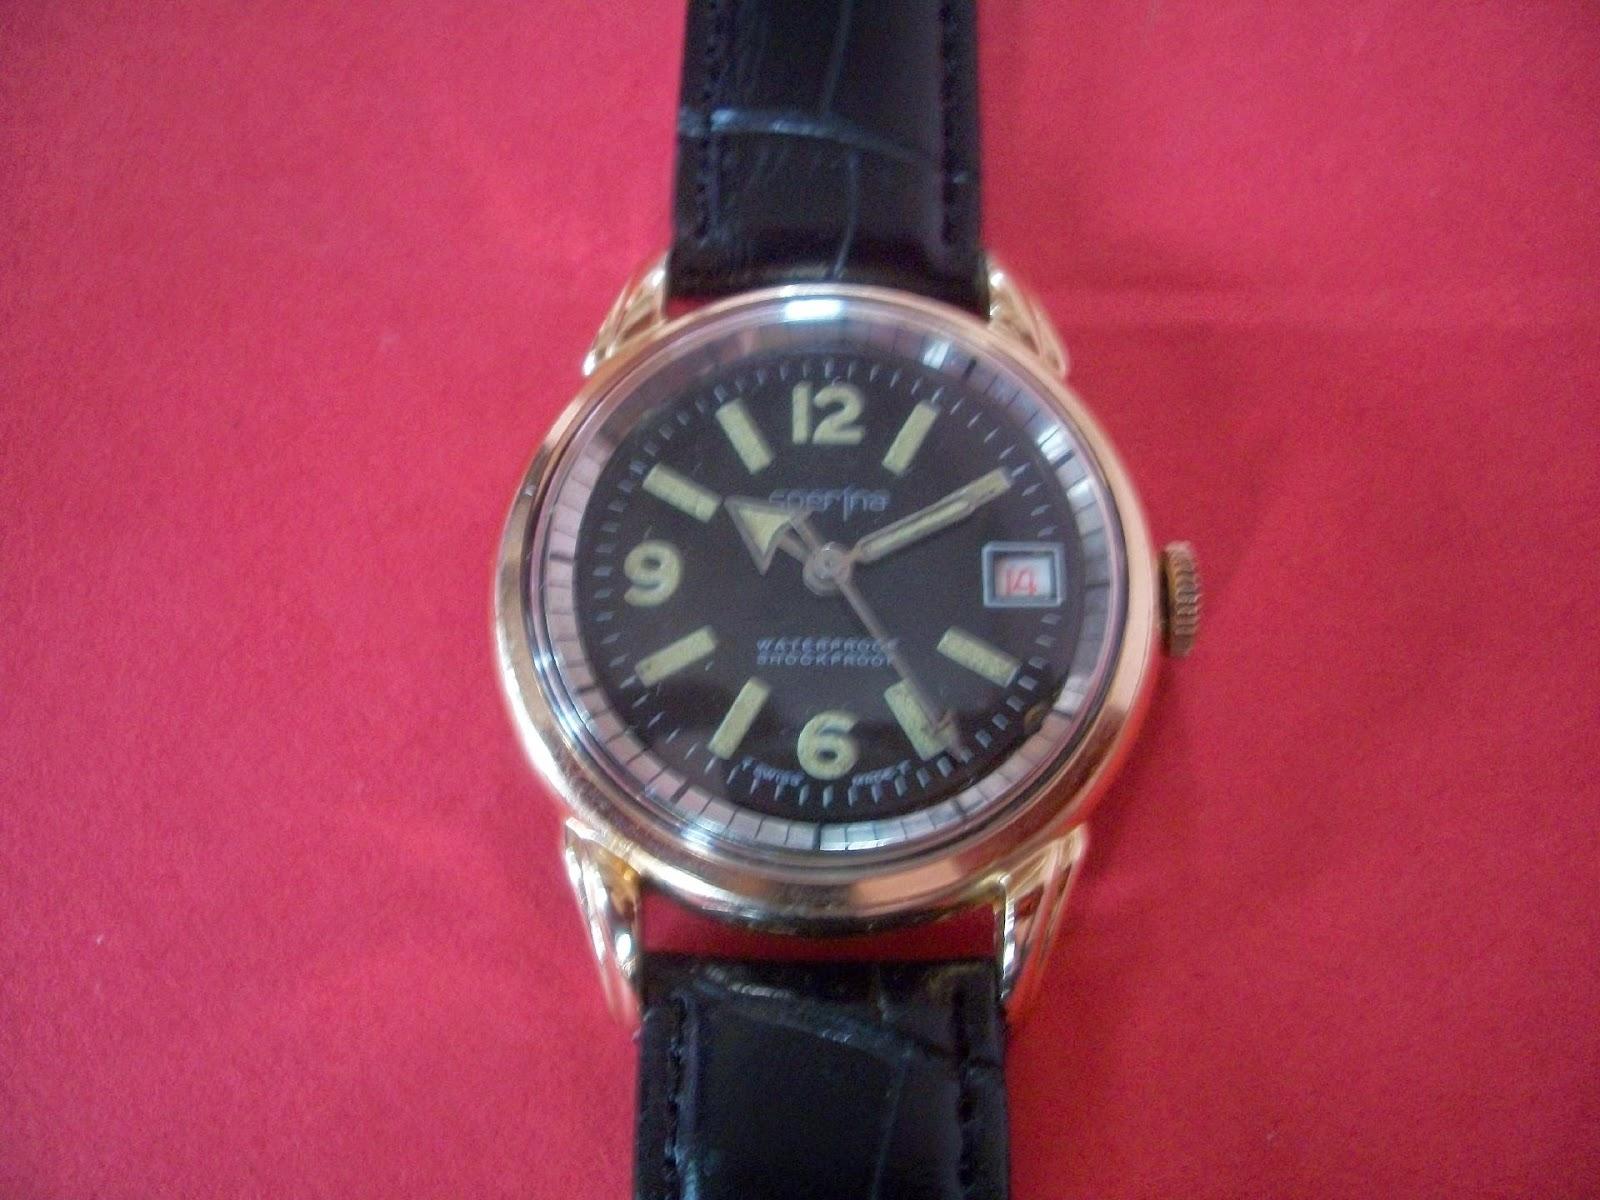 SPERINA Manual Winding vintage Watch